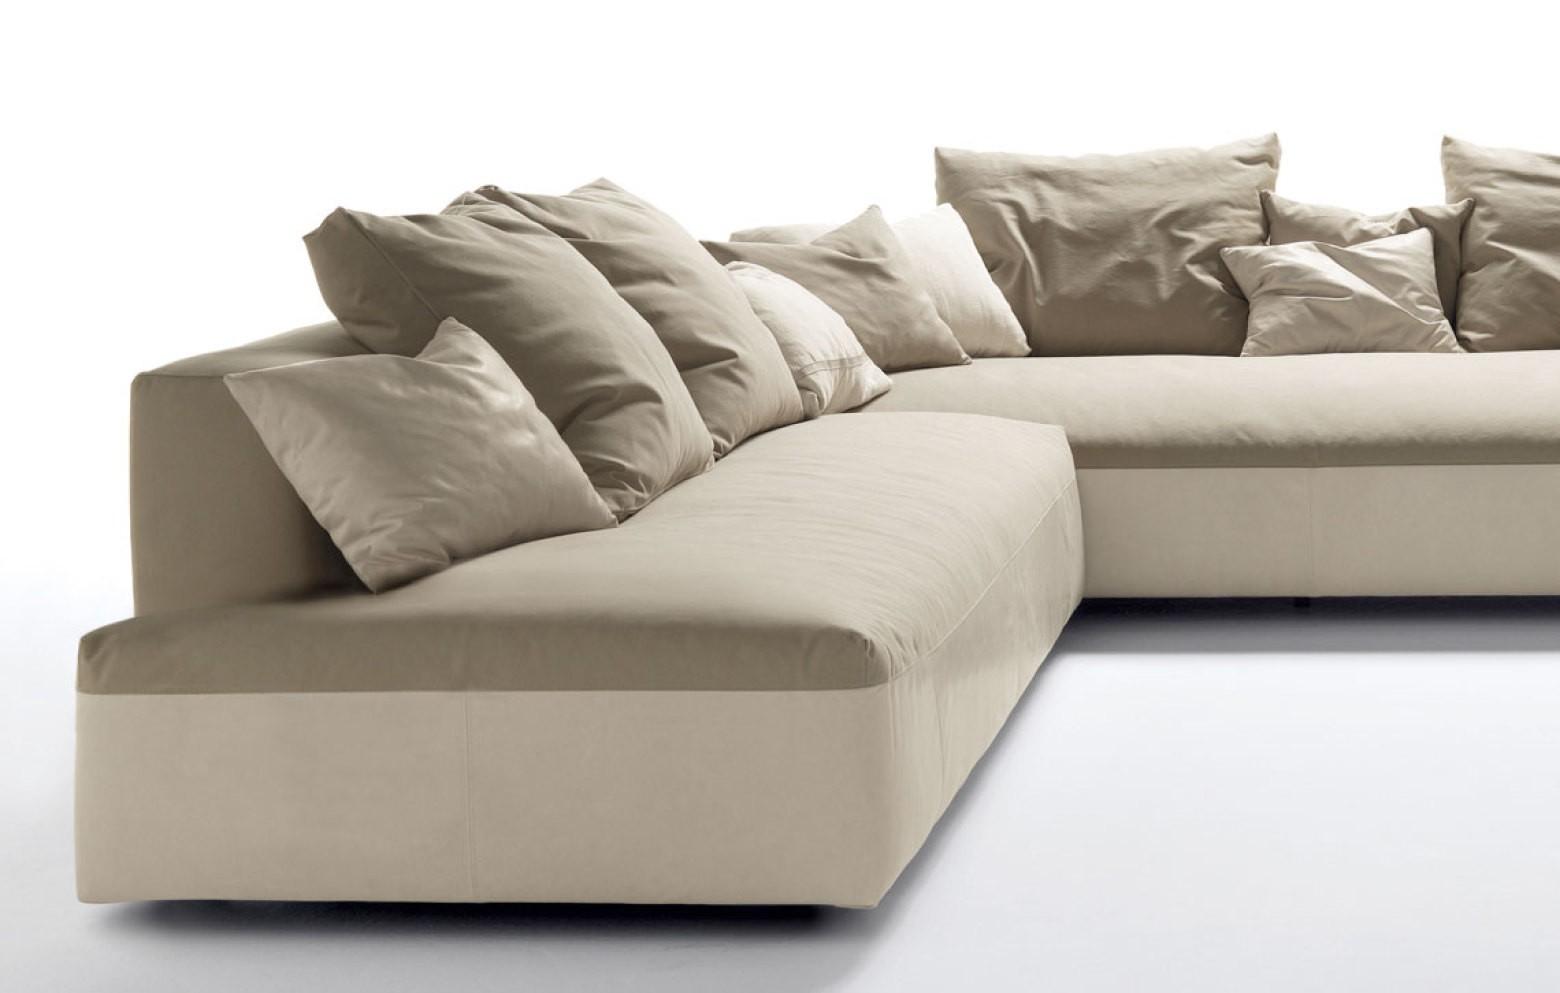 glow in kissen accessoires kleinm bel accessoires who 39 s perfect. Black Bedroom Furniture Sets. Home Design Ideas